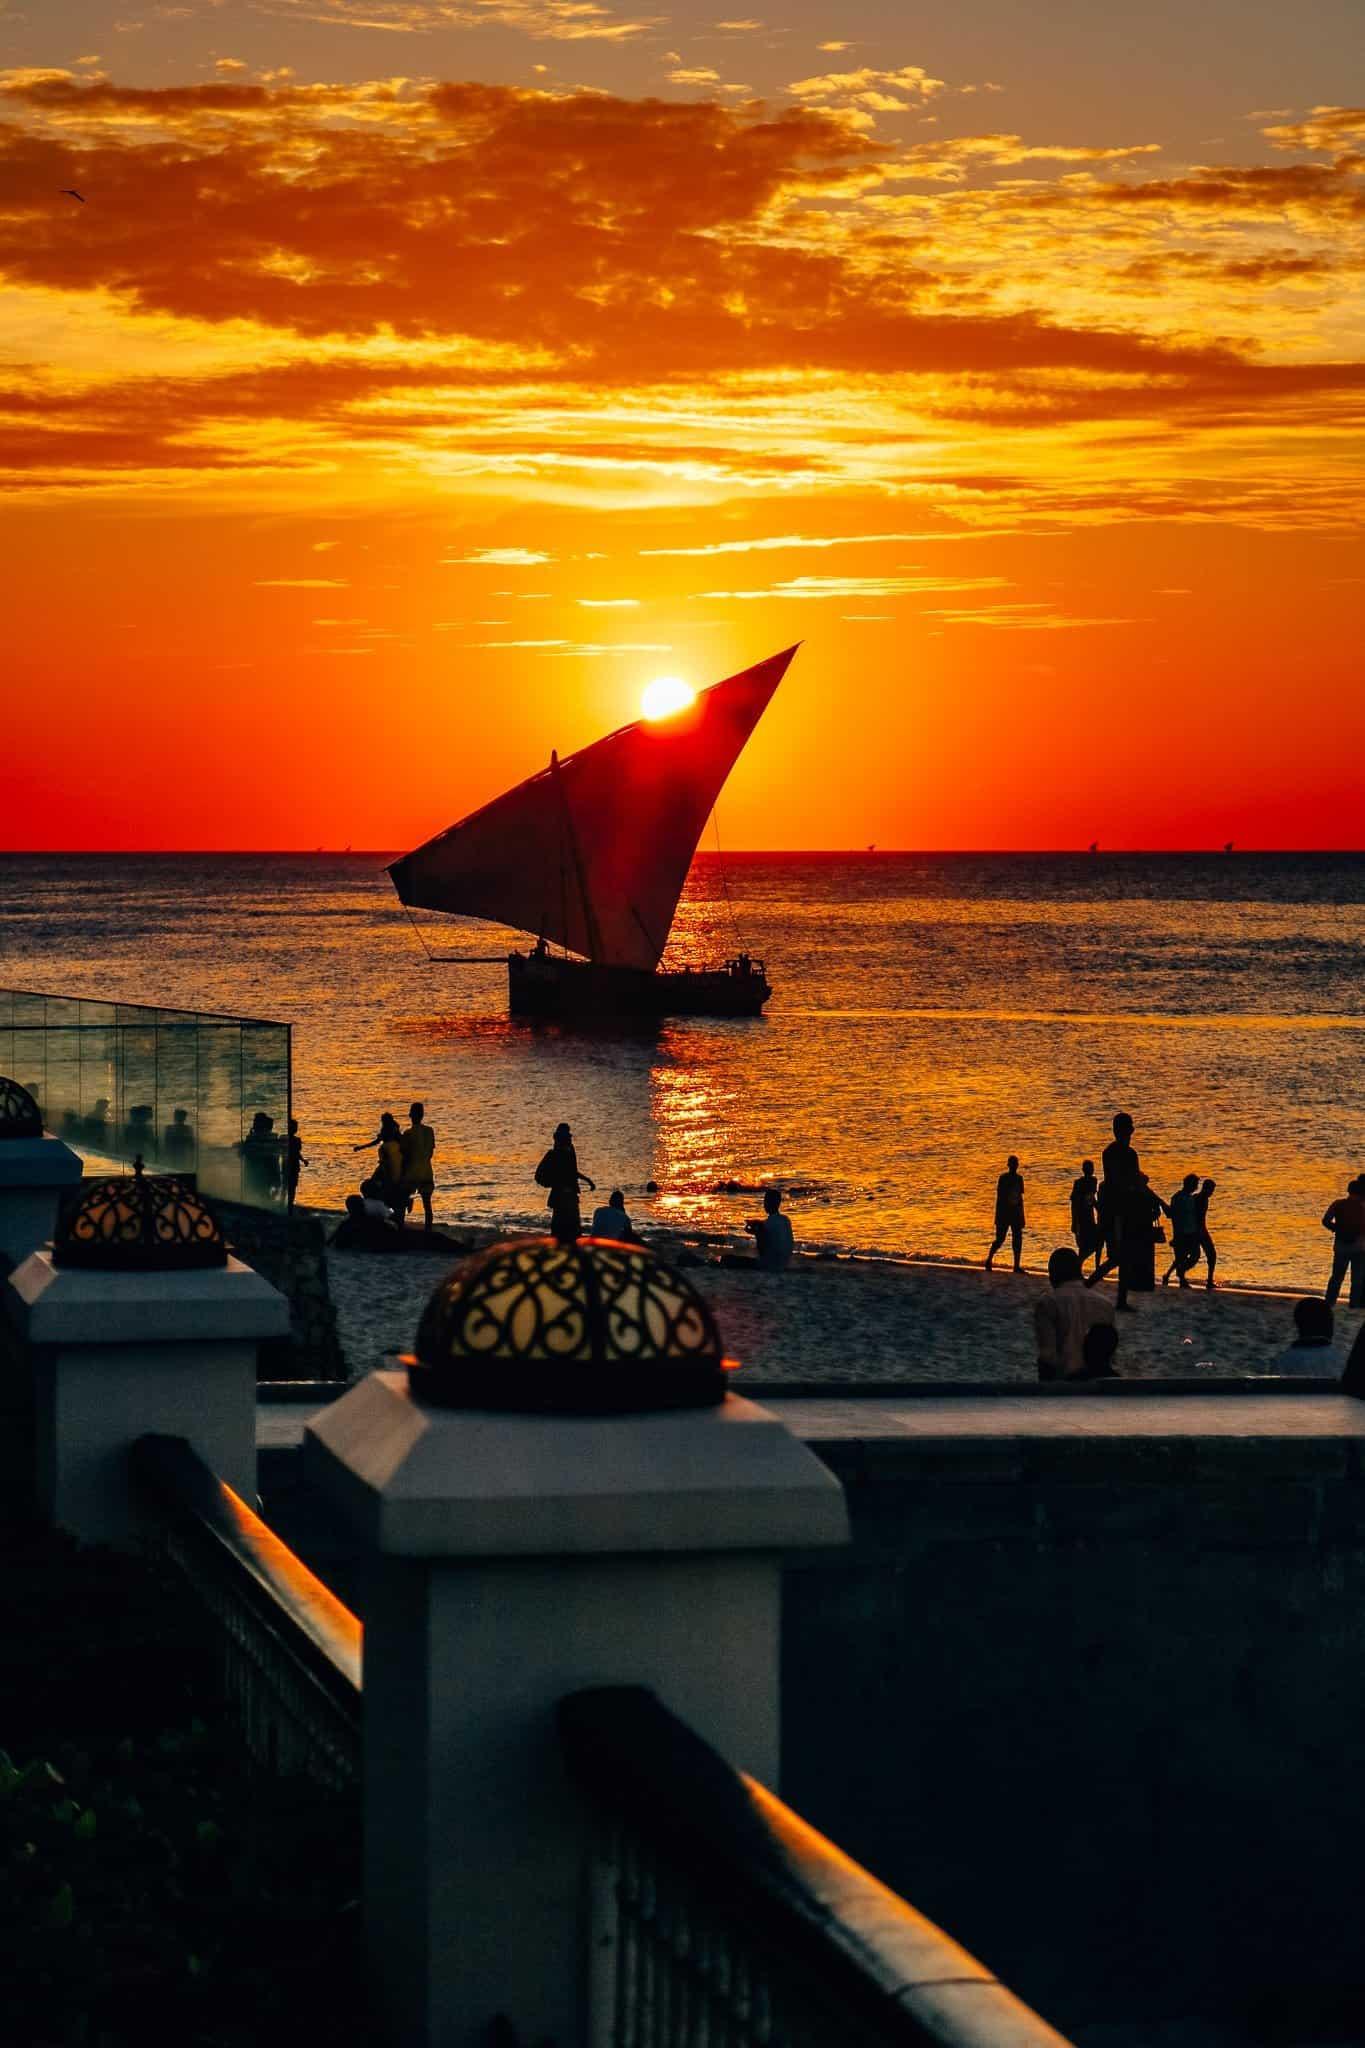 Visions of Zanzibar - Sunset at Park Hyatt Zanzibar